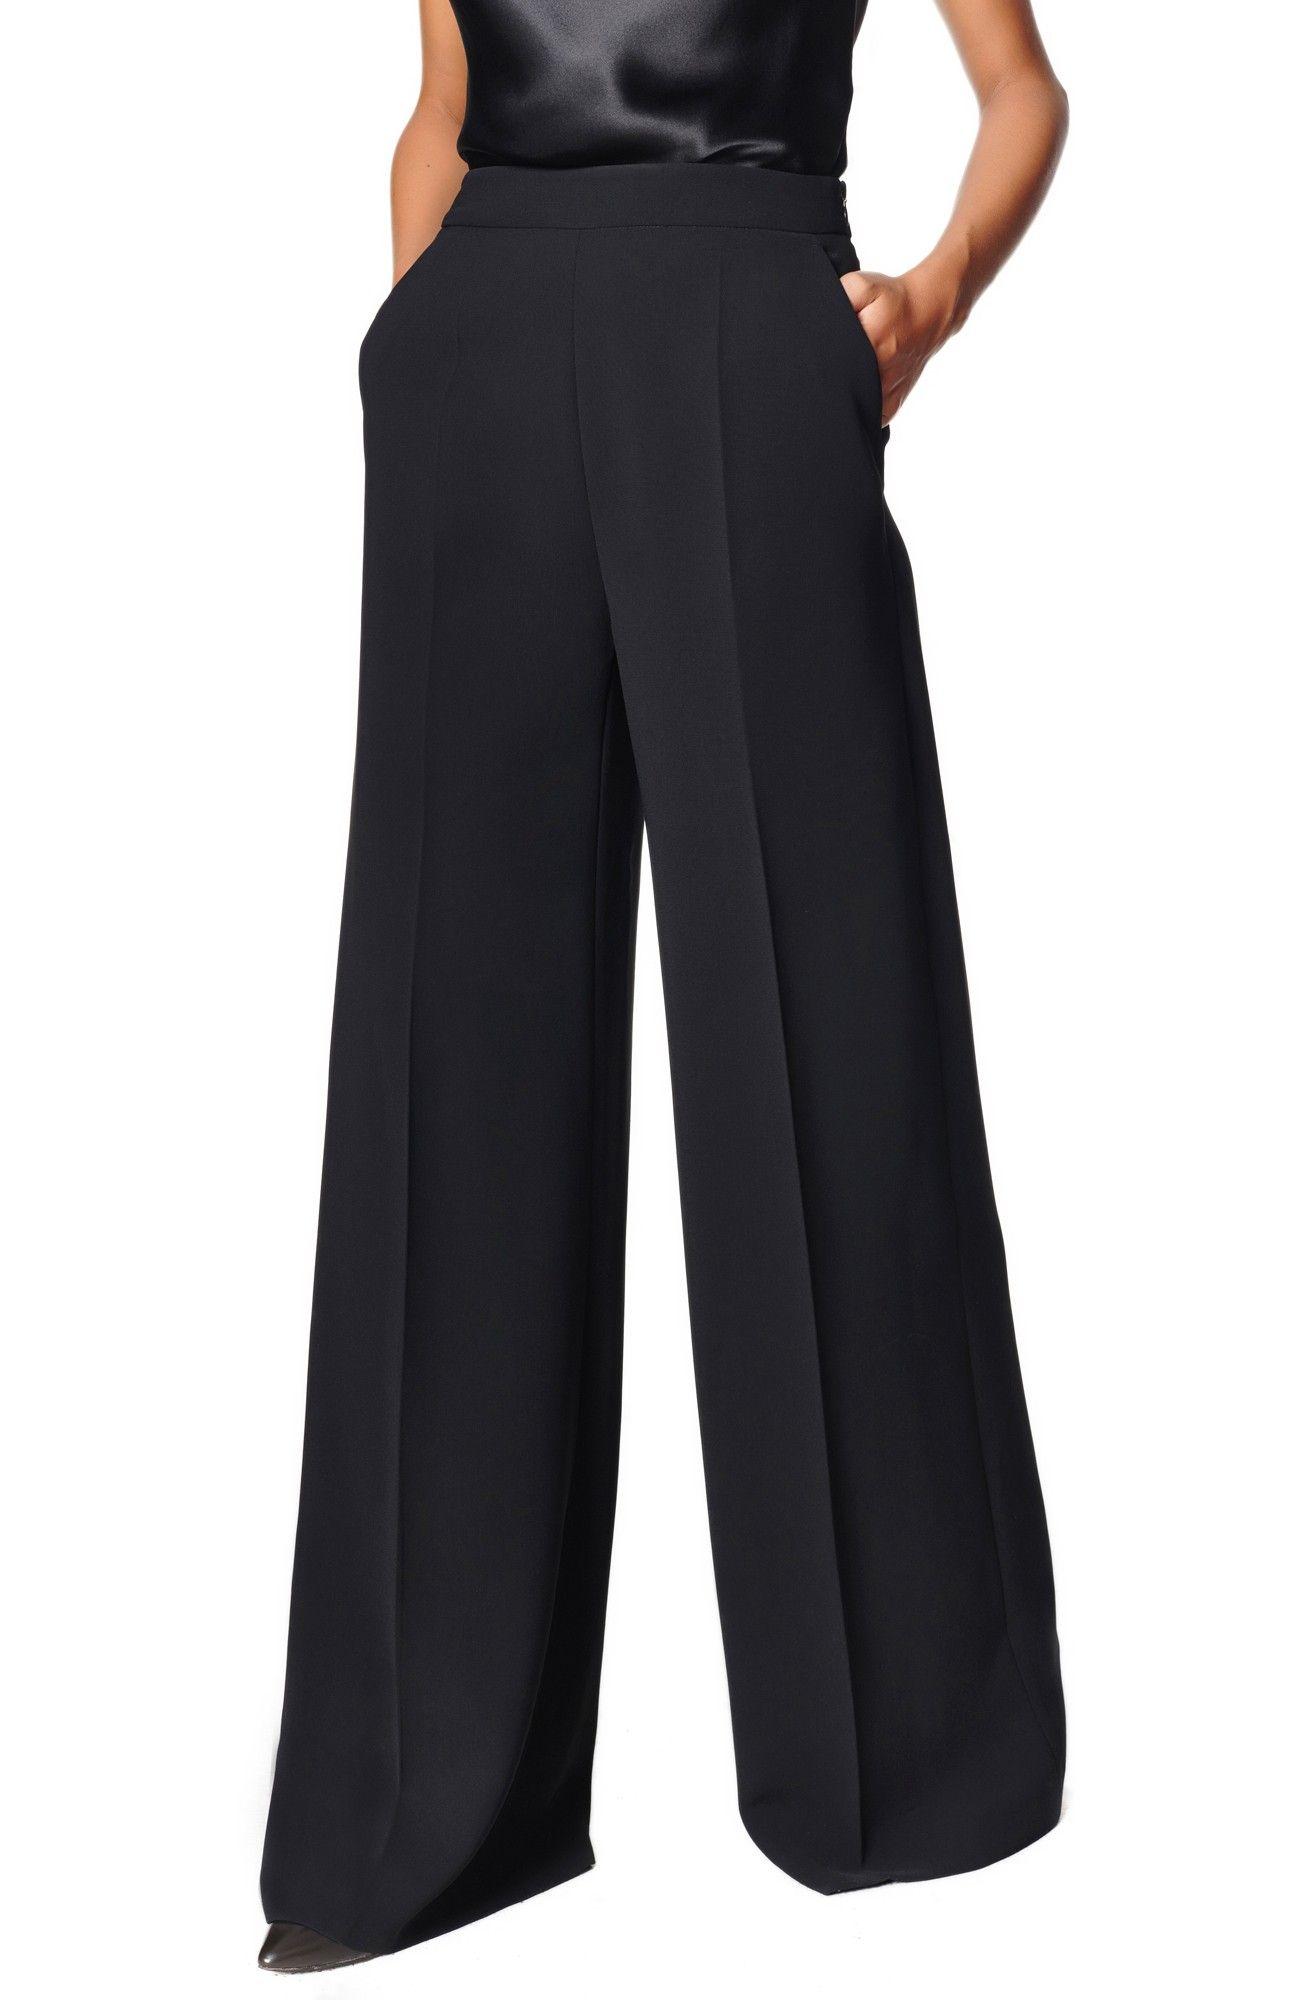 Pantal n pata de elefante pantalones adolfo dominguez for Adolfo dominguez costura